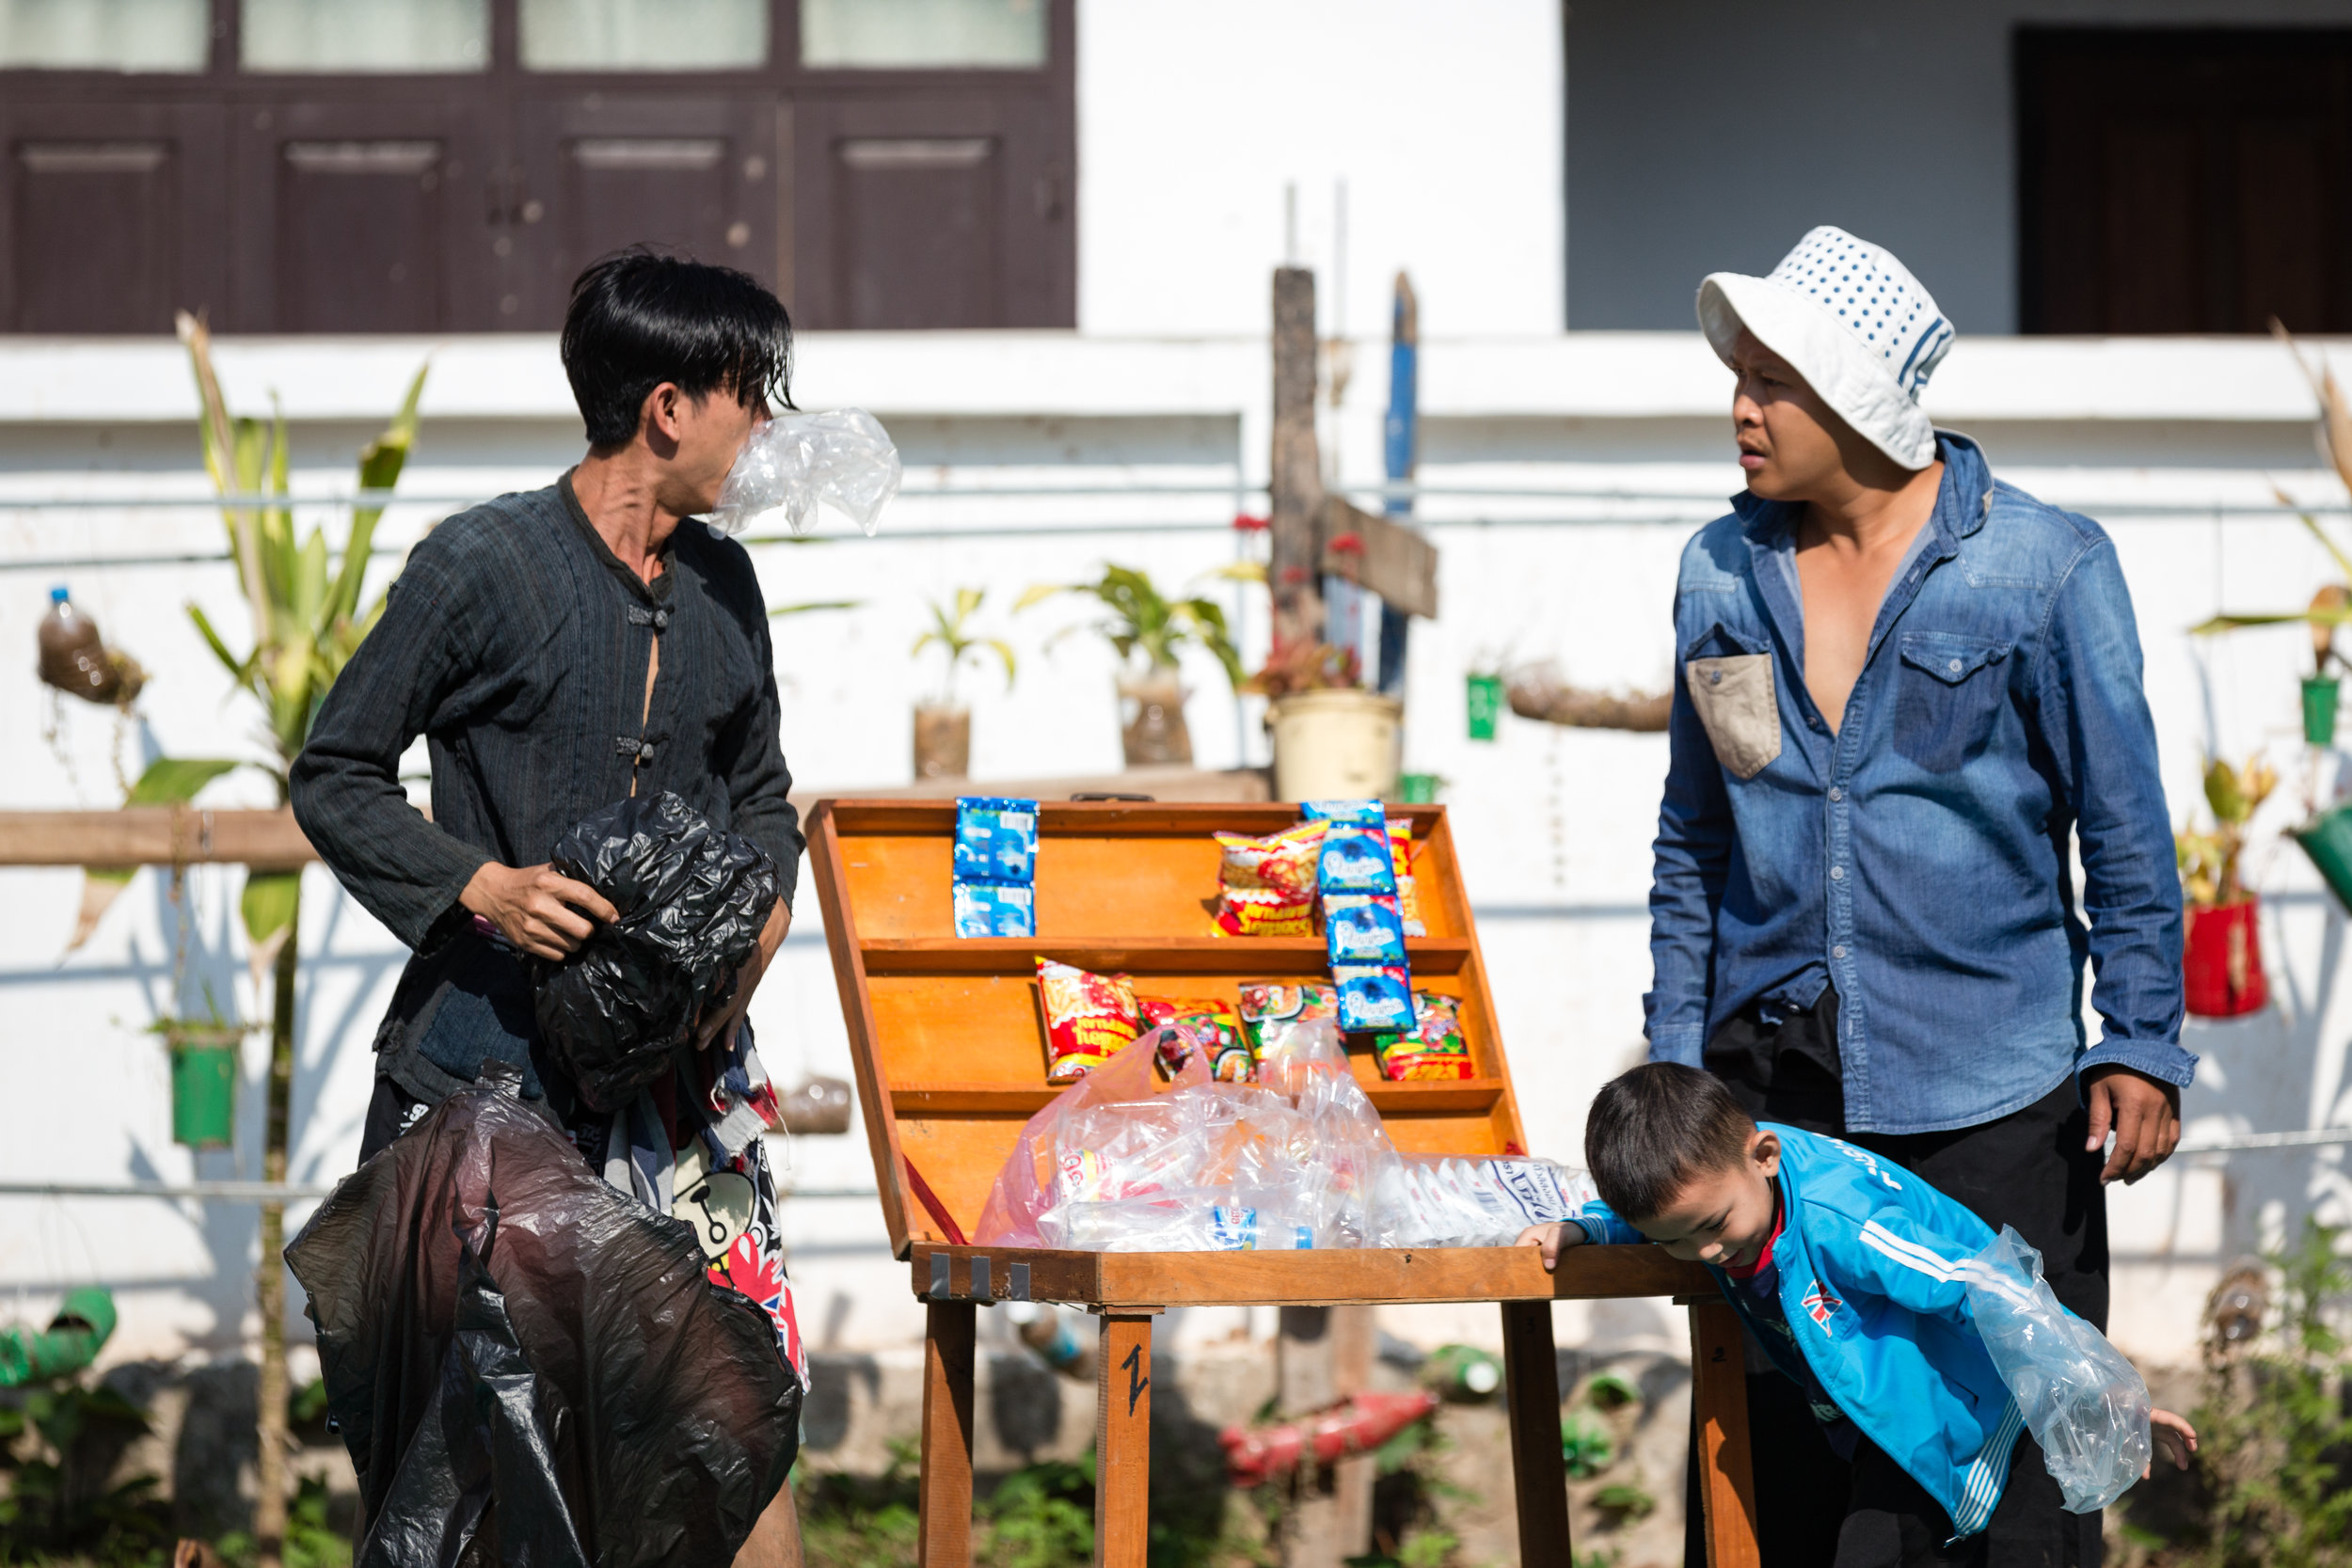 Laos-Luang-Prabang-GIZ-German-Parliament-waste-performance-Photo-by-Cyril-Eberle-CEB_2716.jpg